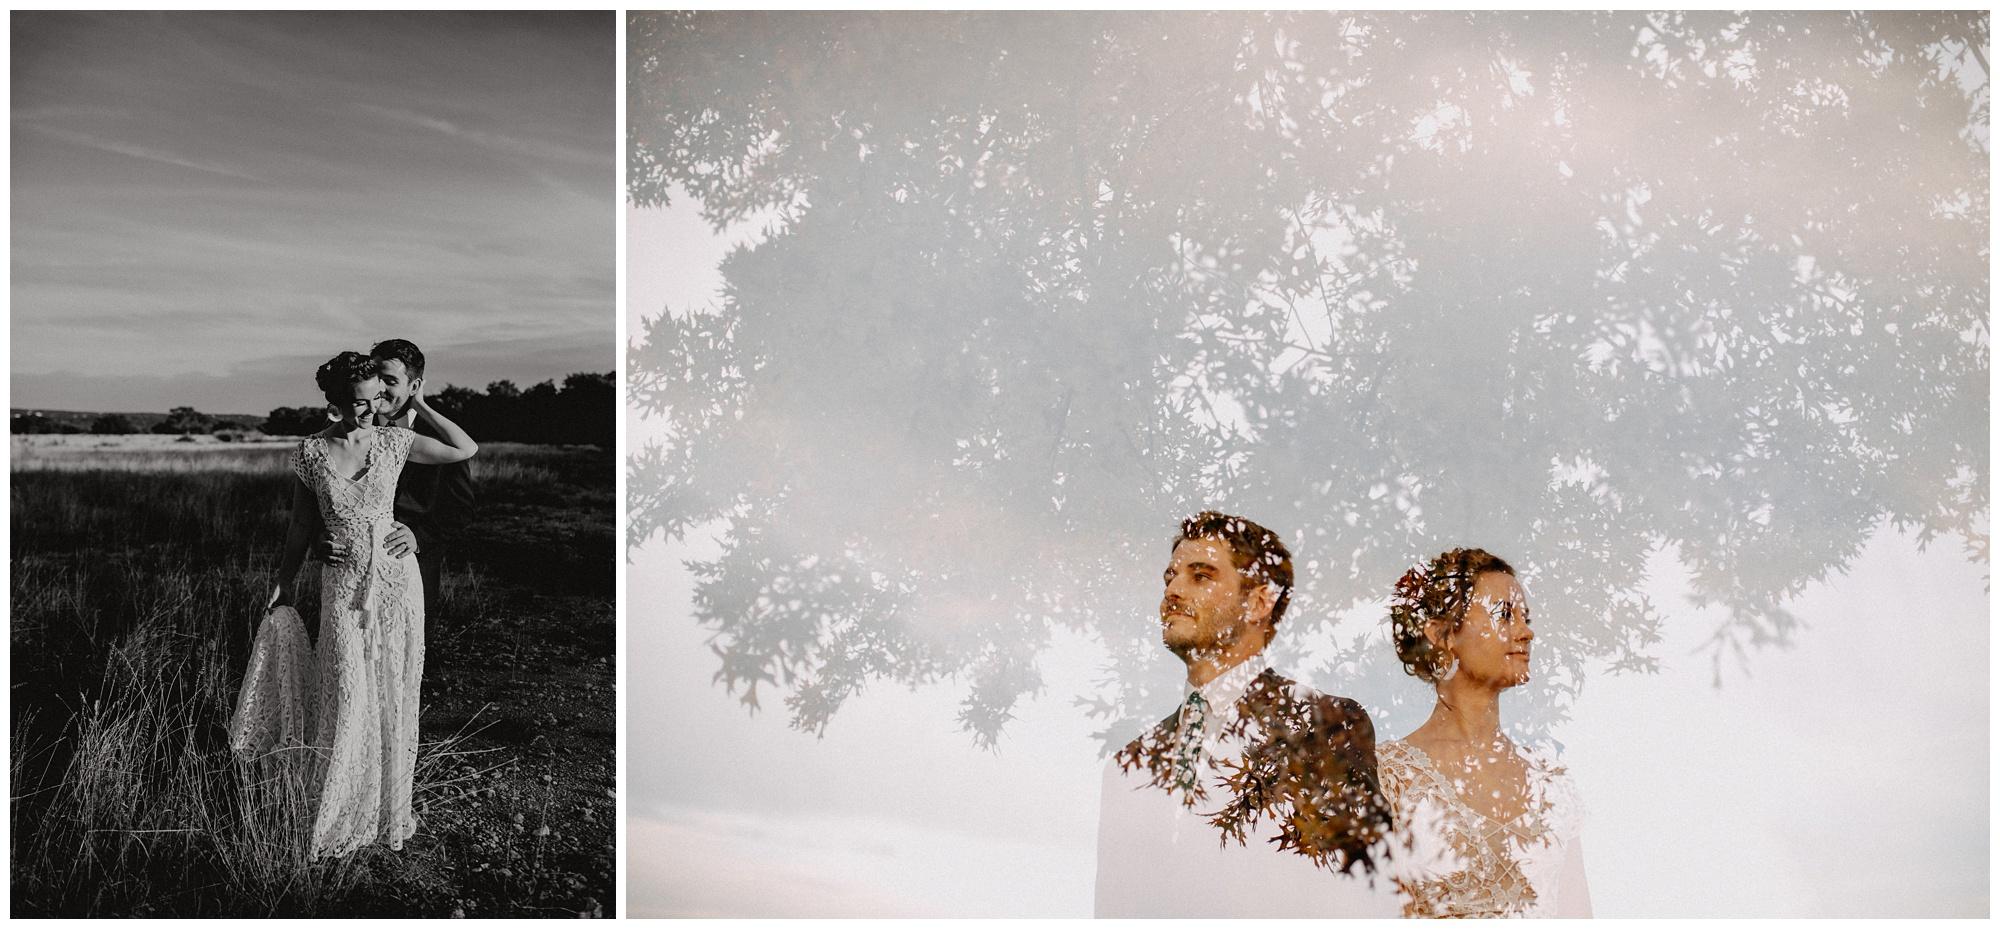 AUSTIN-TEXAS-PROSPECT-HOUSE-WEDDING-VENUE-PHOTOGRAPHY25810.JPG